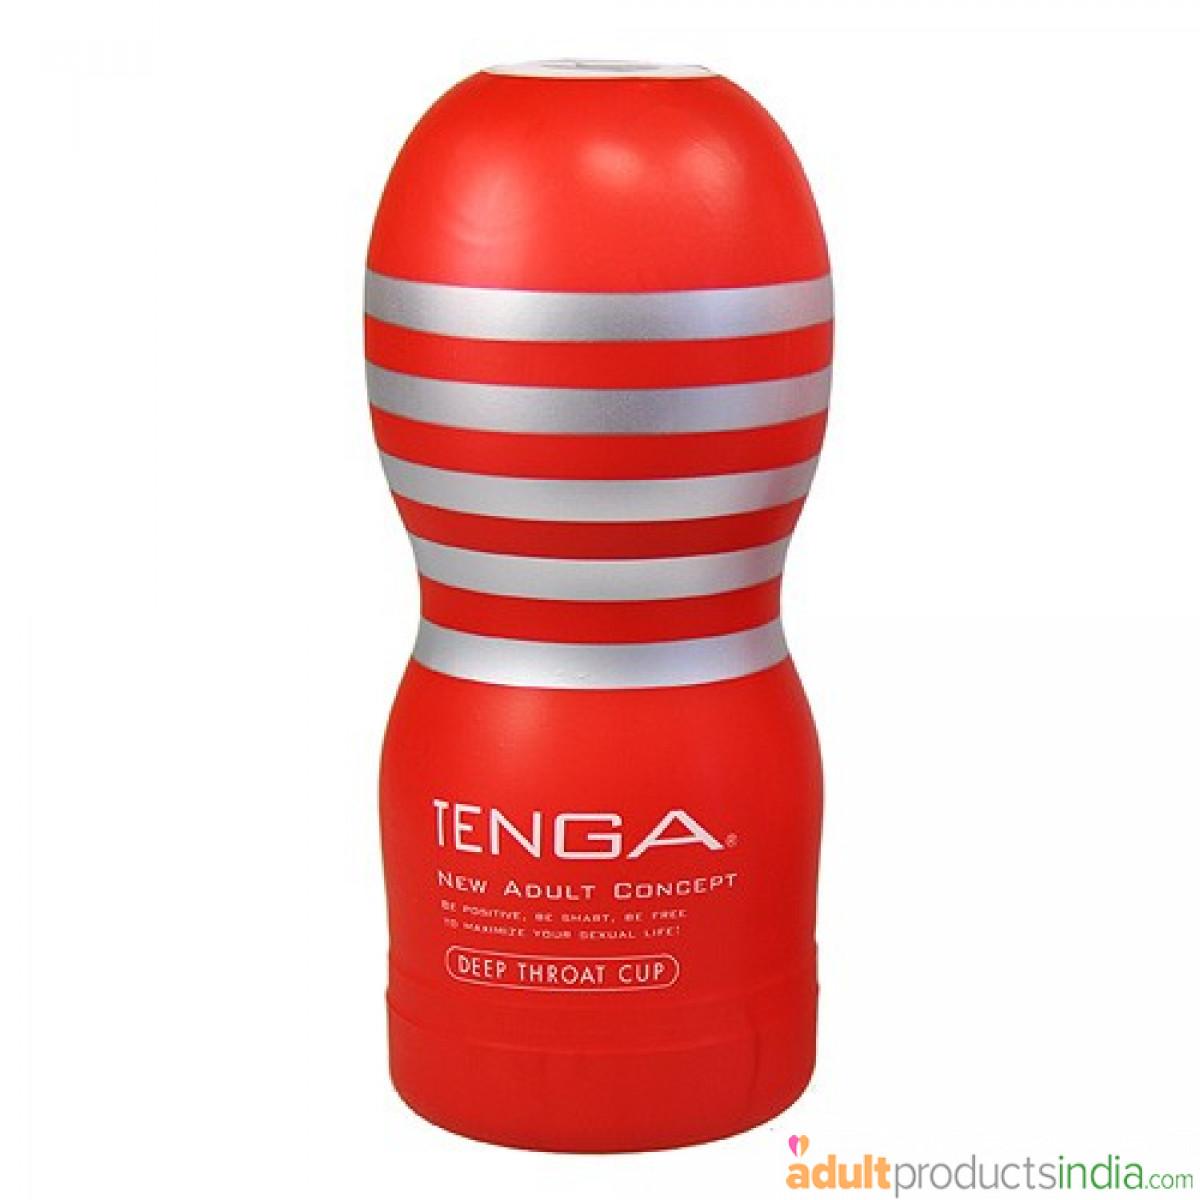 Tenga Deep Throat Cup - 101